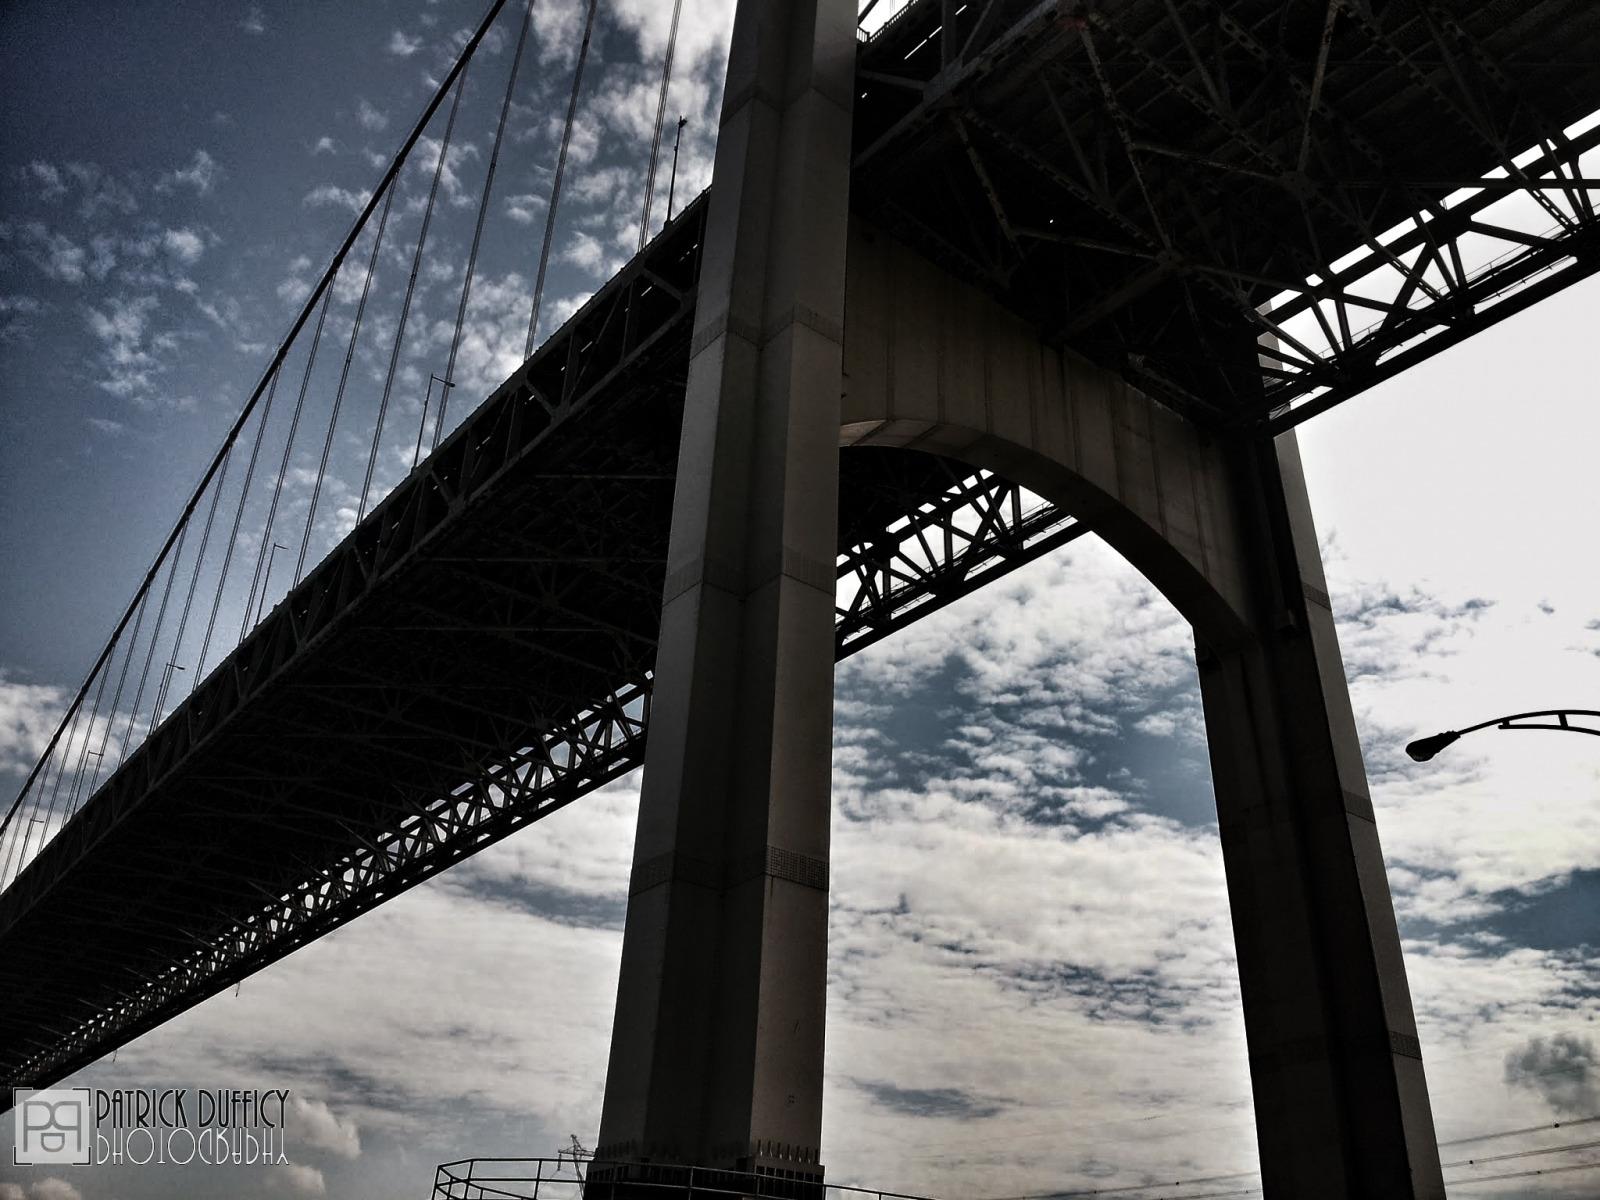 pierre-laporte-bridge_15589011723_o